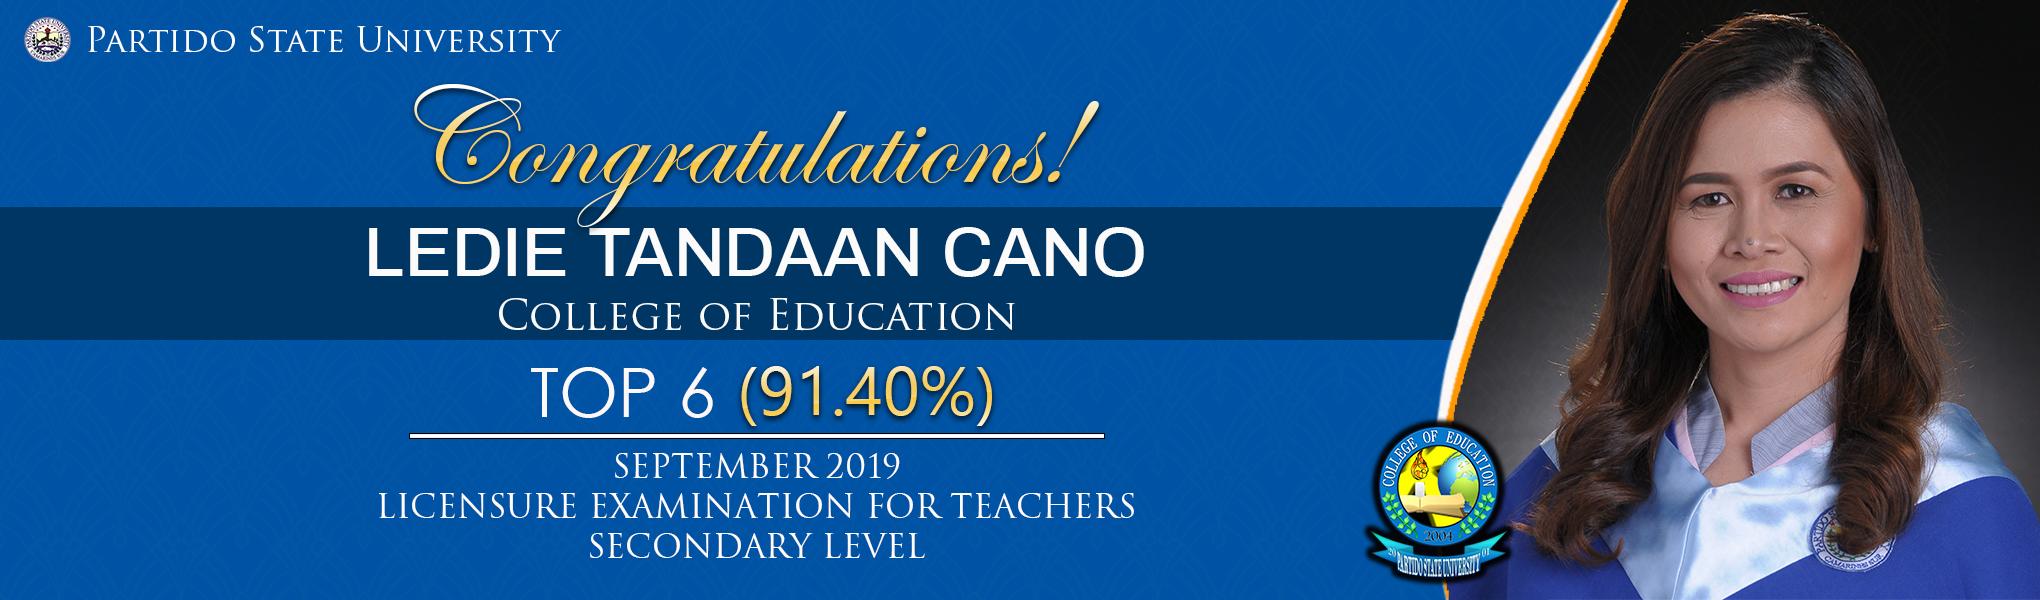 Congratulations, Ledie Tandaan Cano!